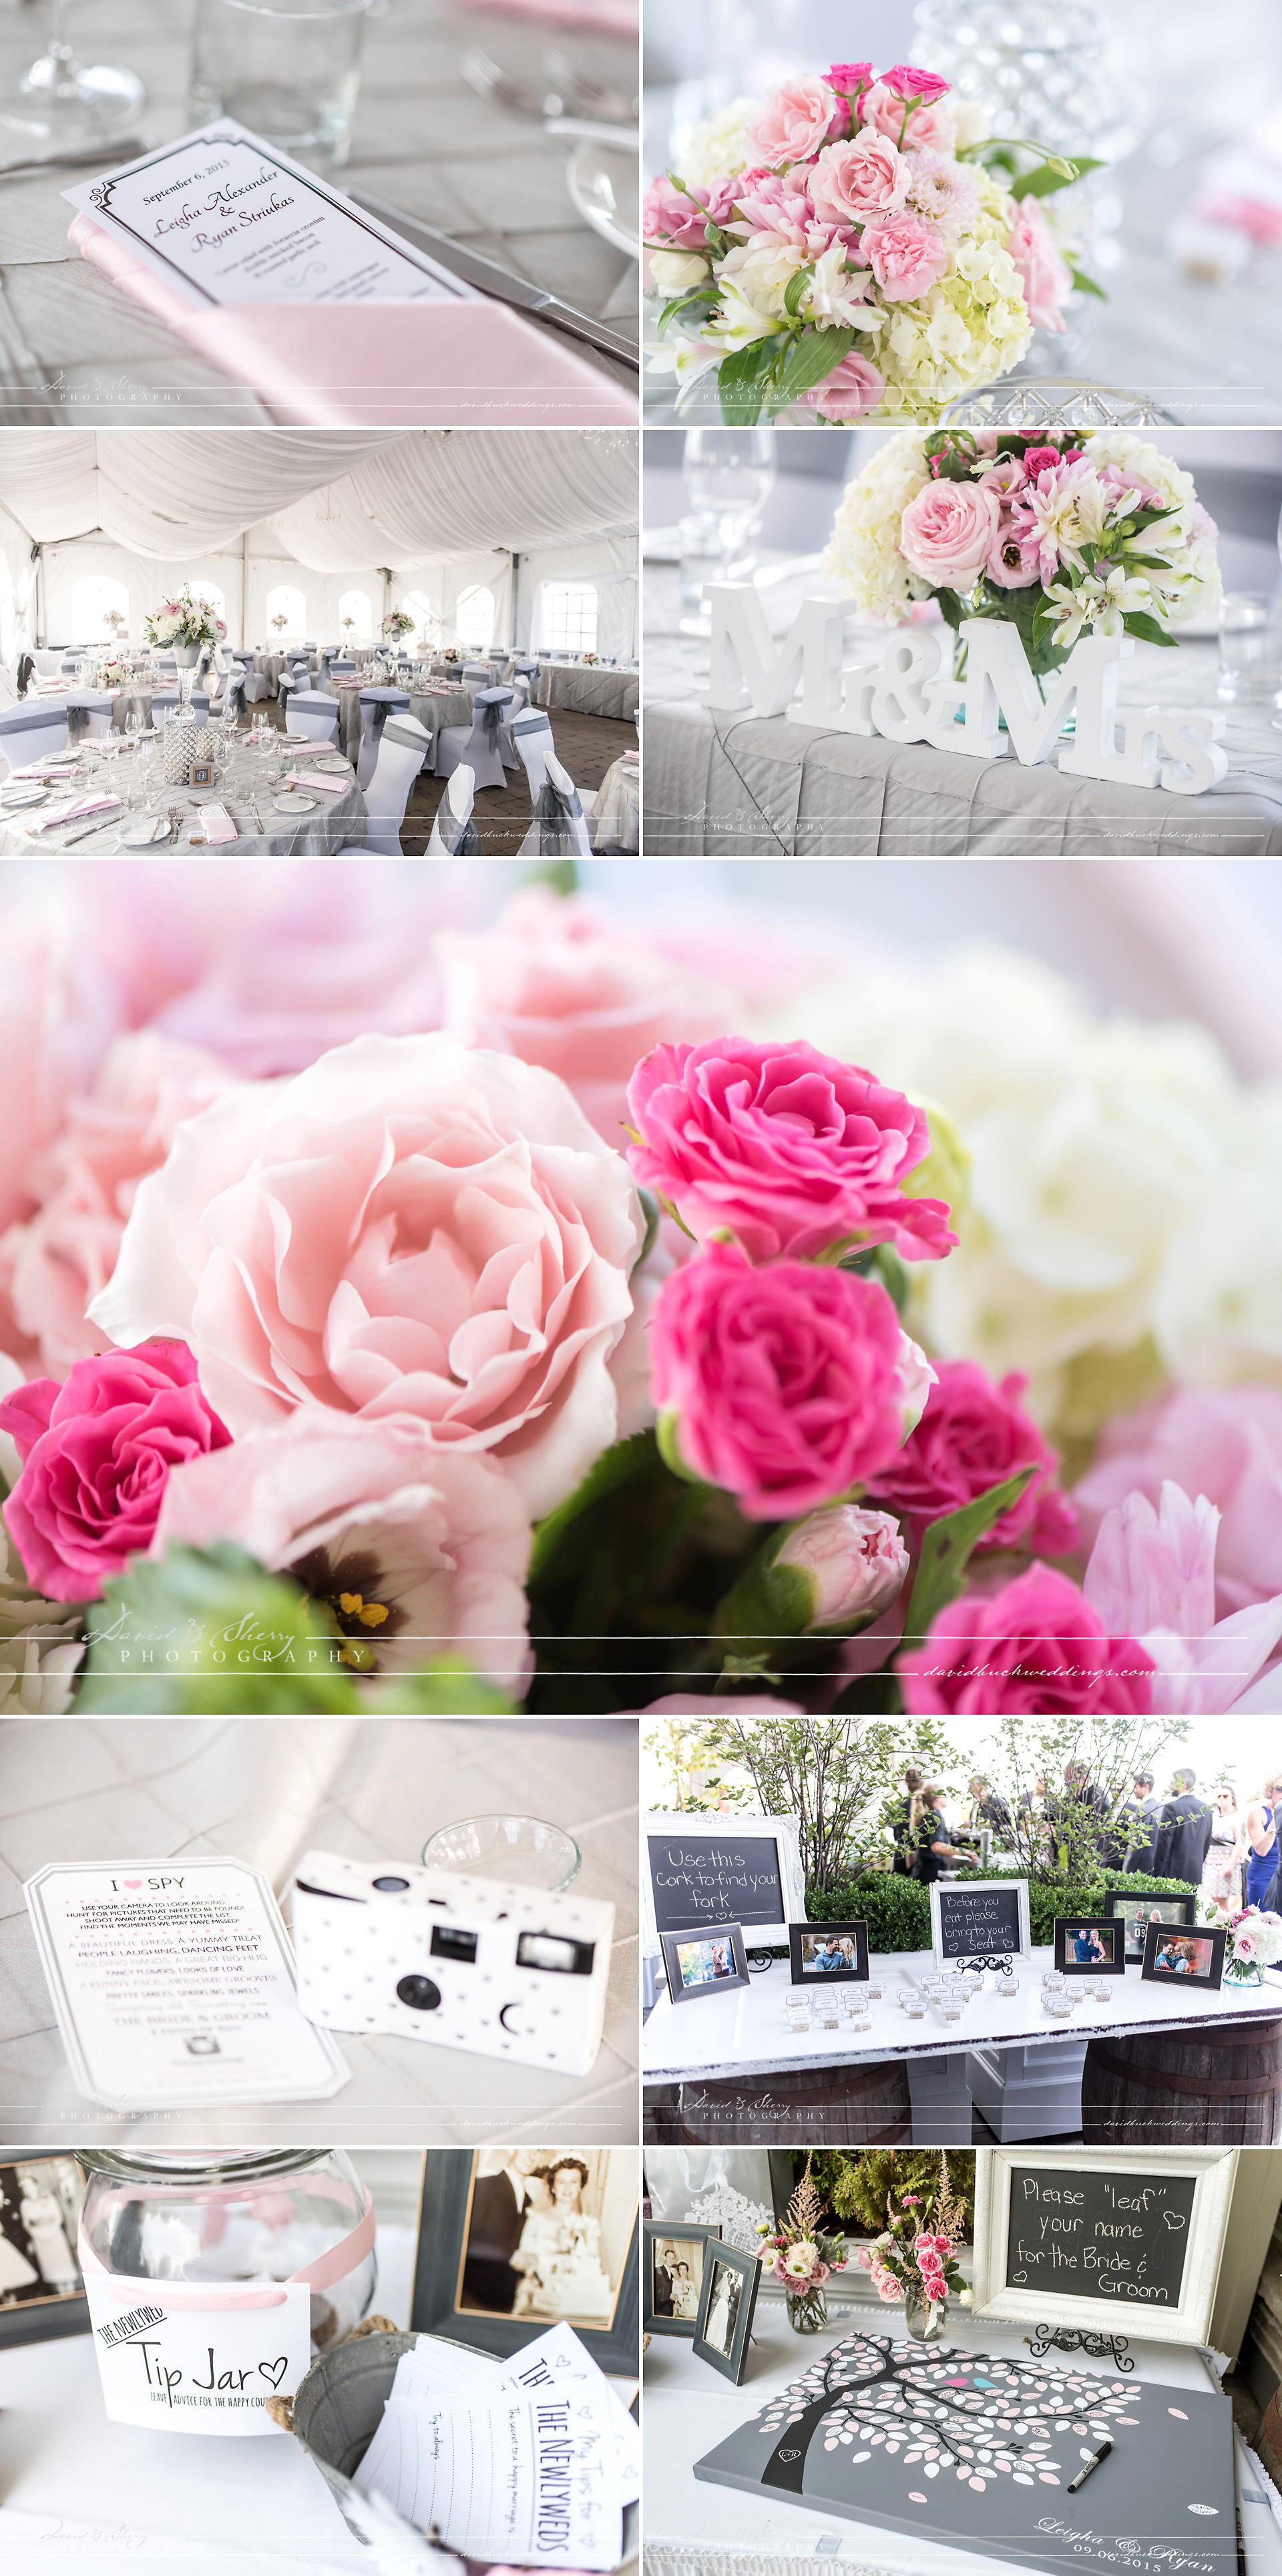 Cobble_Beach_Wedding_Photography_032